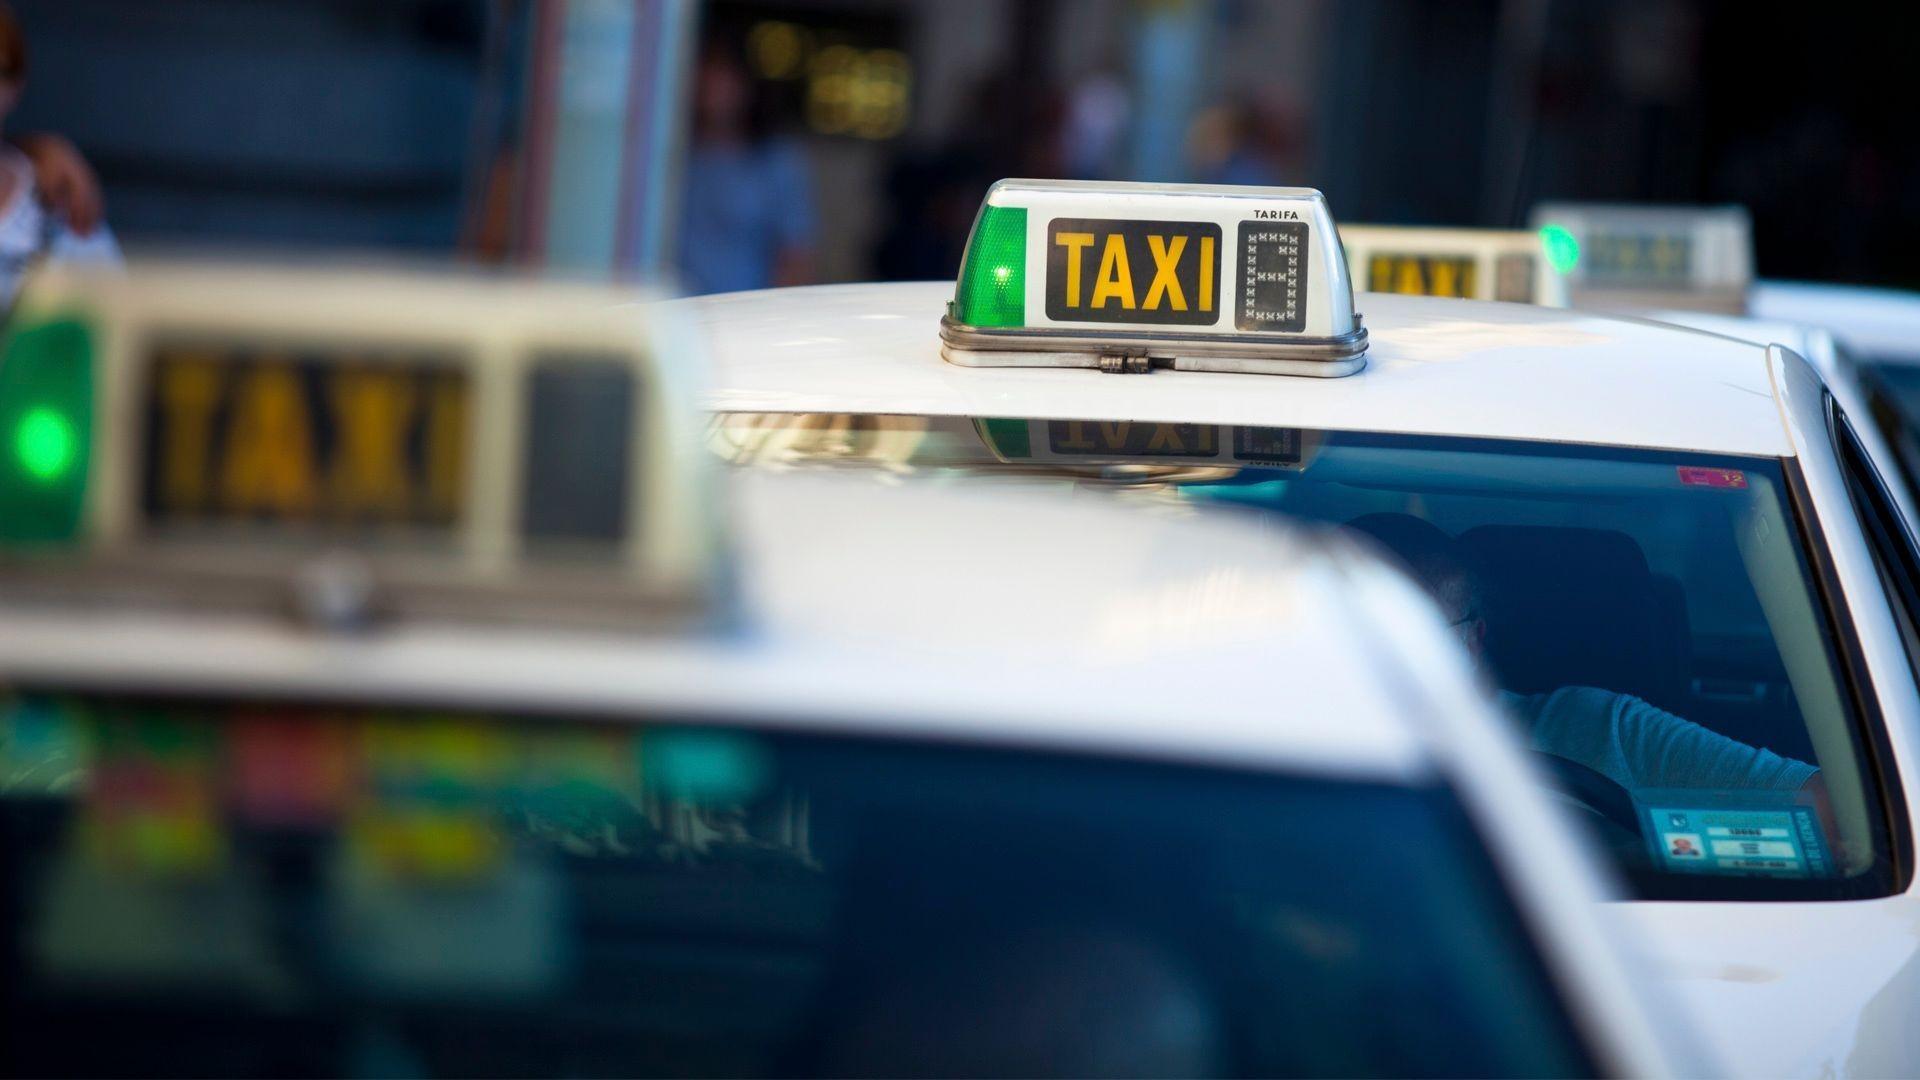 Servicio de taxi en Miranda de Ebro